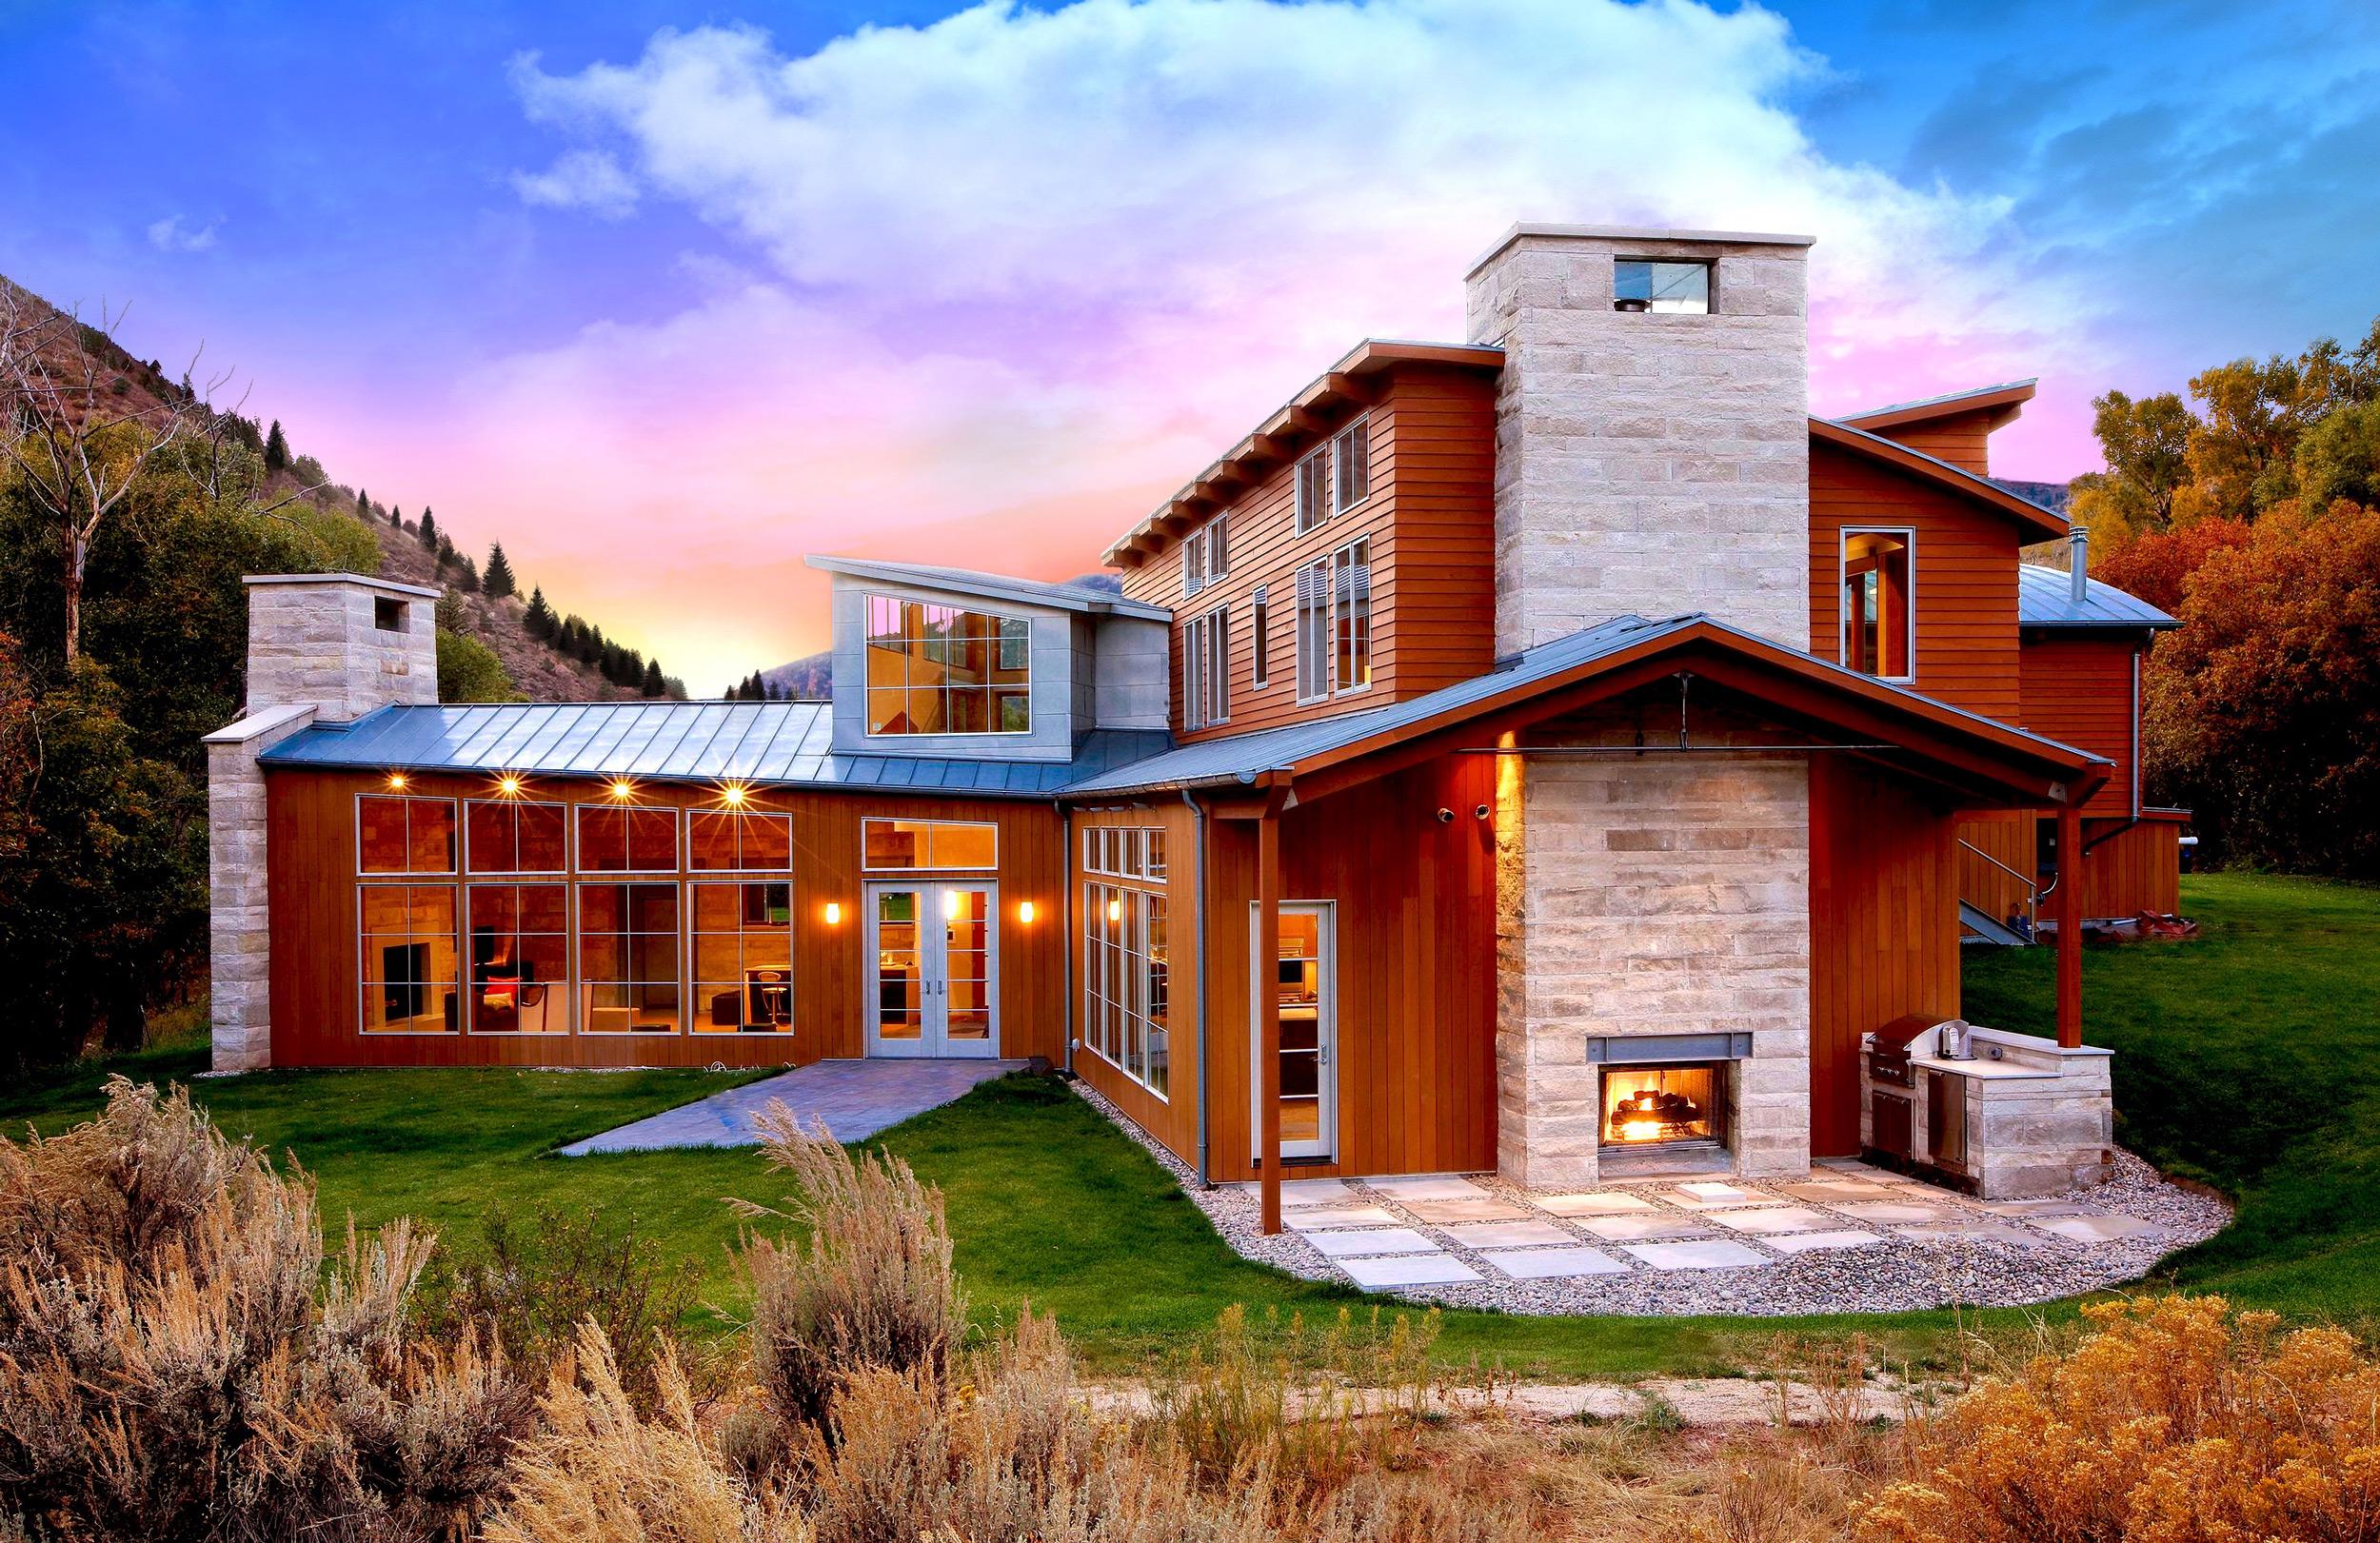 Fire Feature - Indiana Limestone